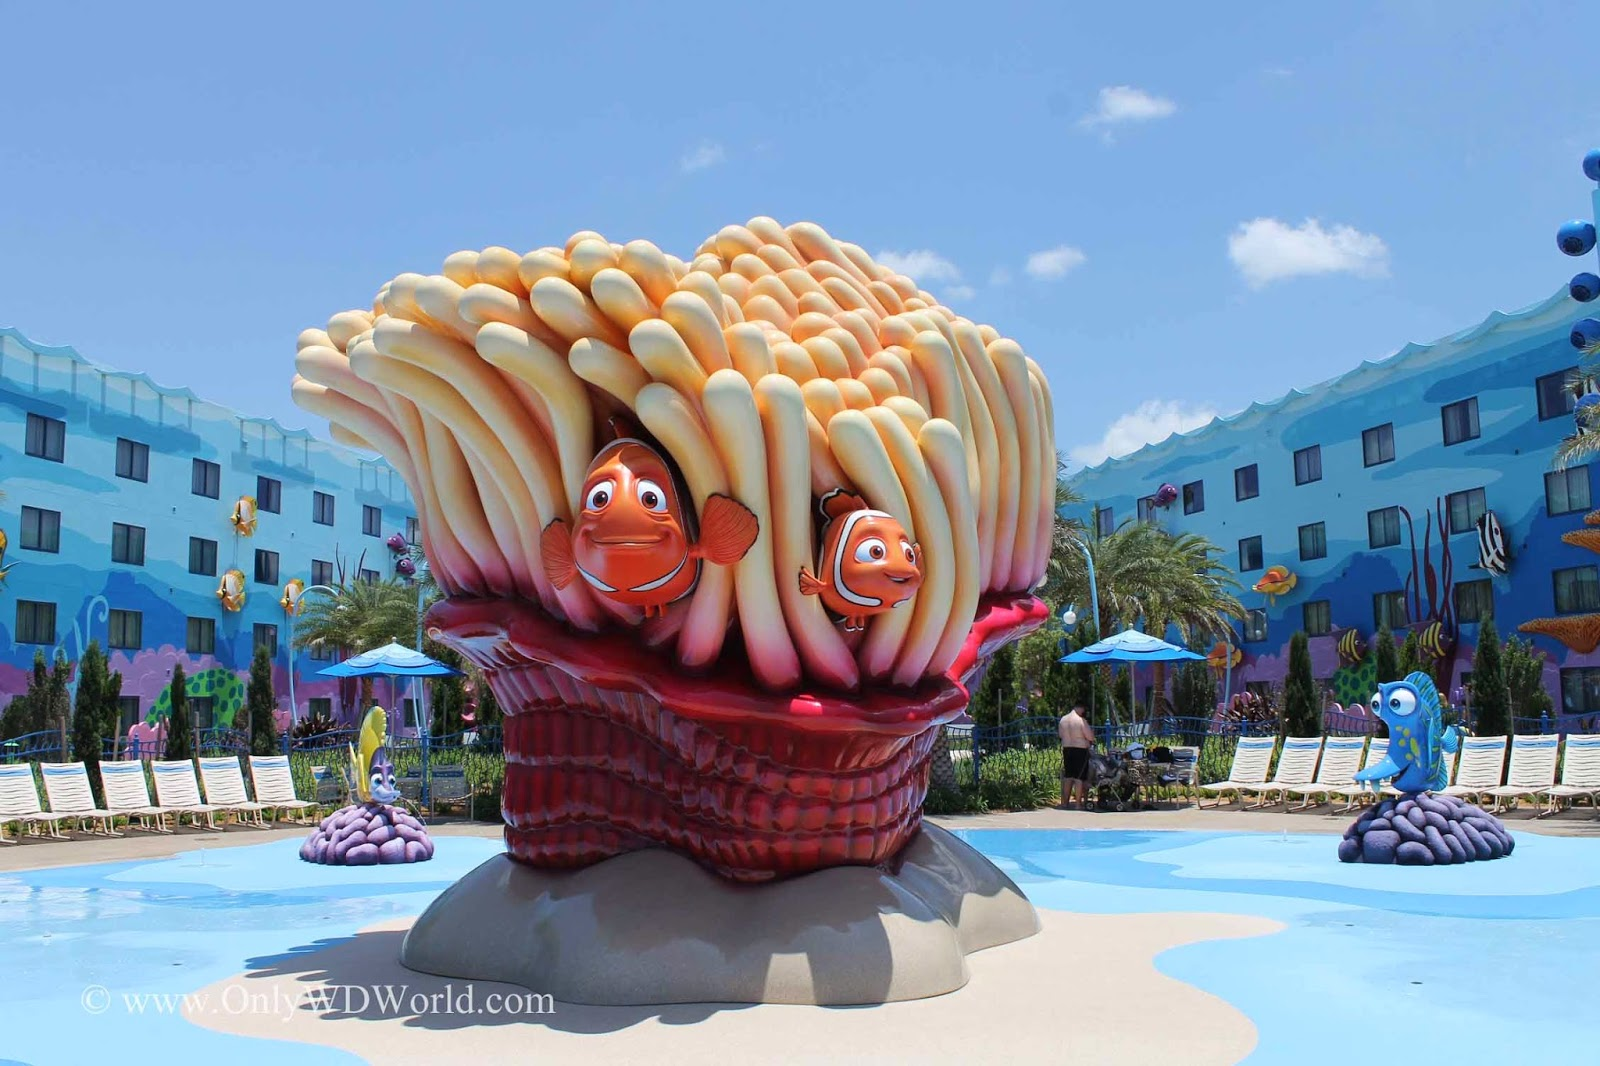 Disney Pixar Movie Finding Nemo Themed Pool At Disney 39 S Art Of Animation Resort Disney World